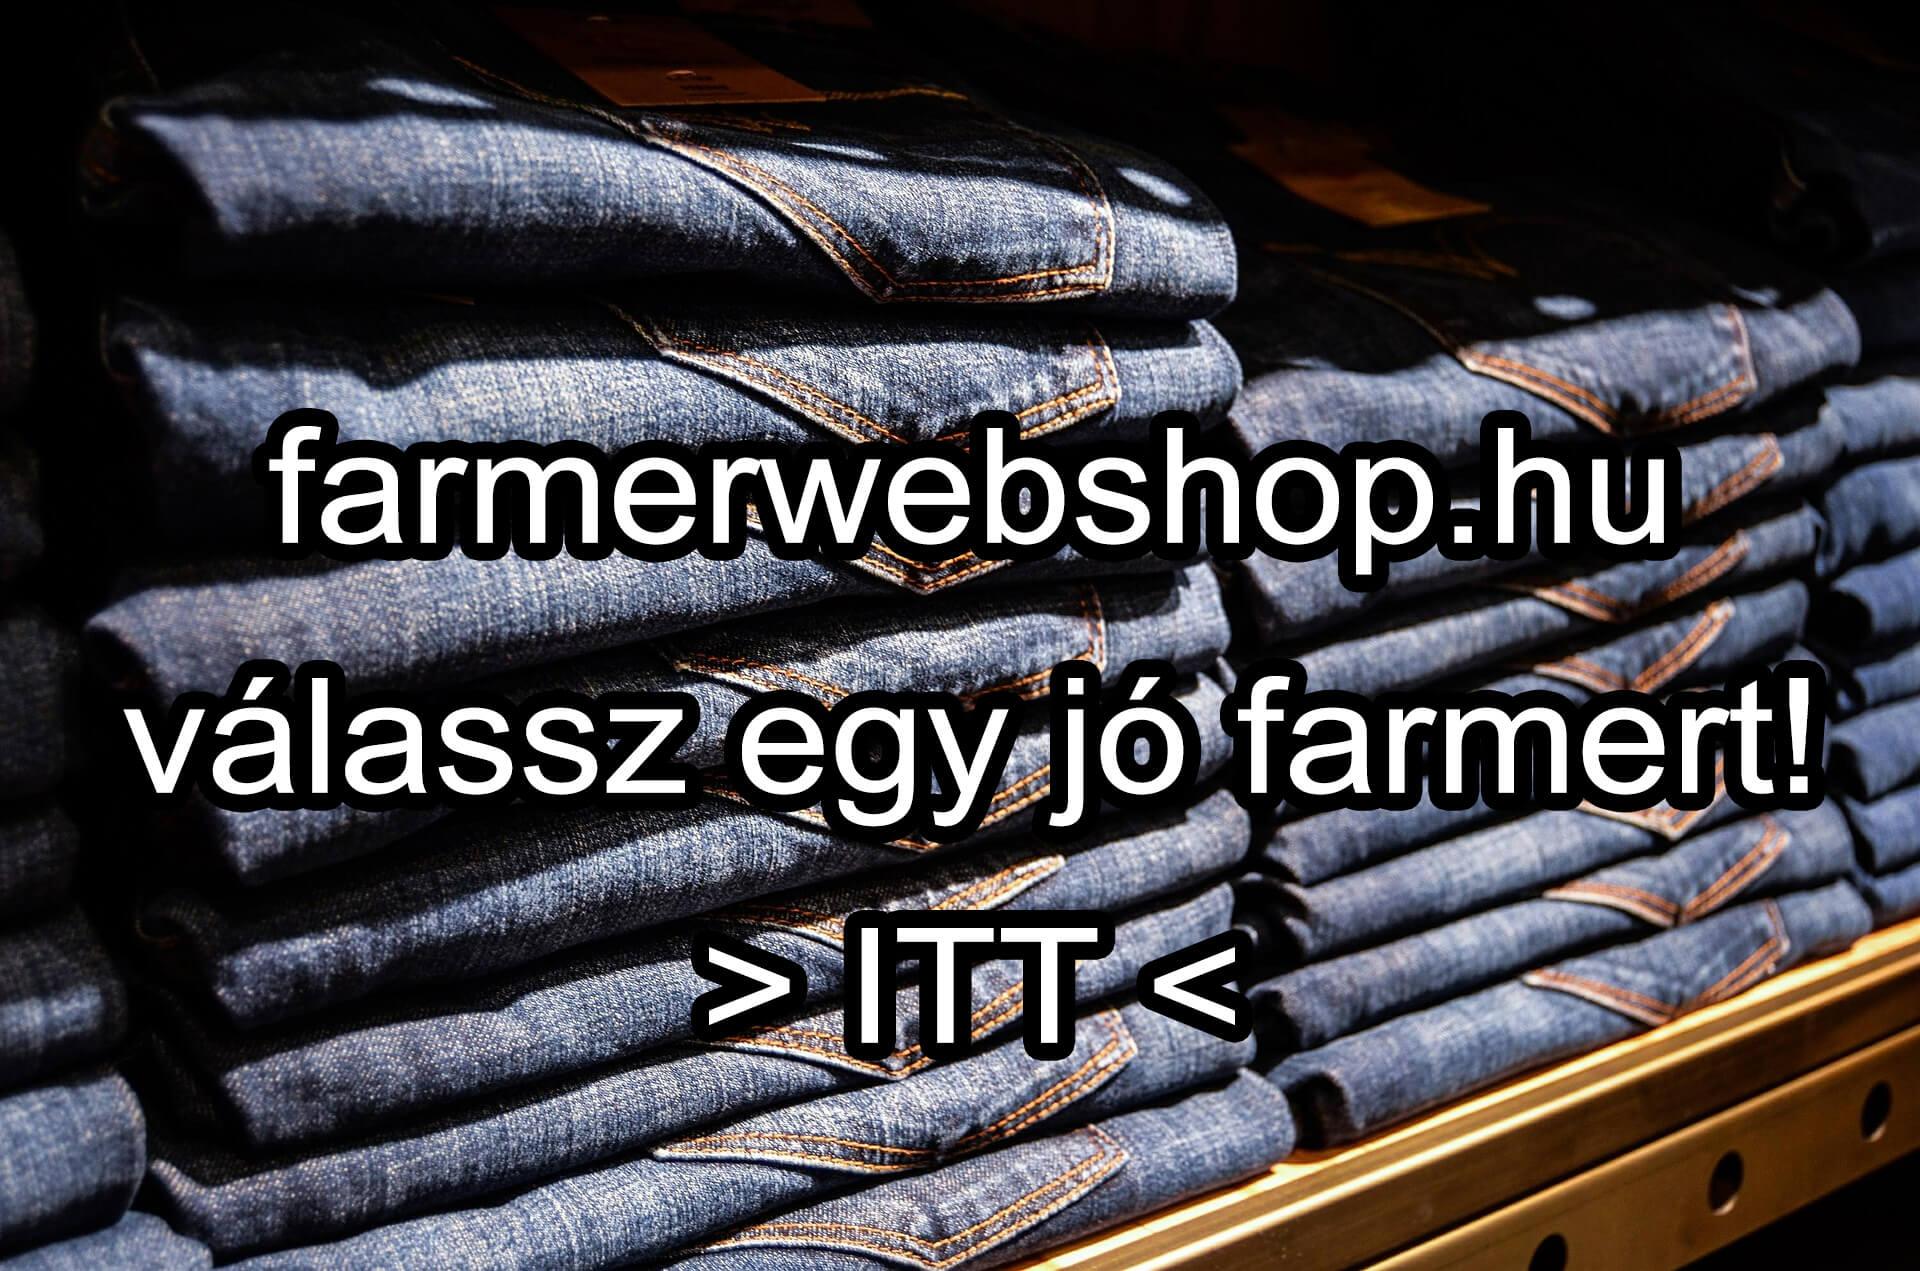 Farmer webshop